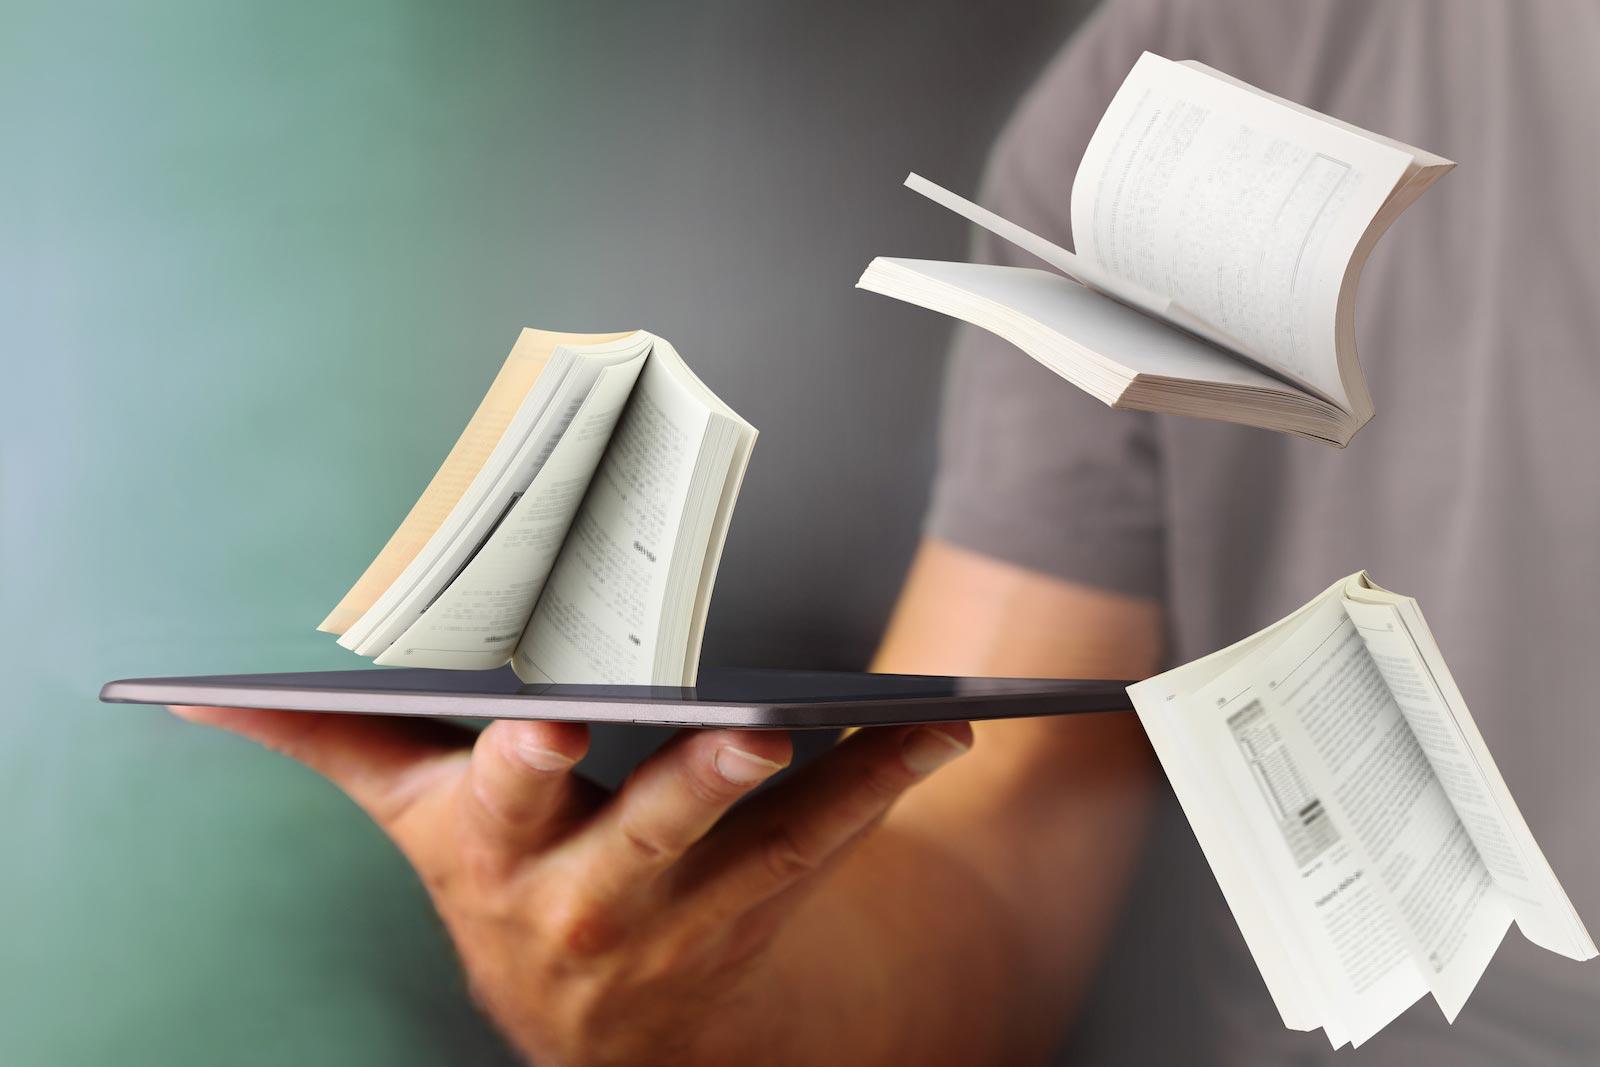 Lectura veloz: aprende a leer más de 12 libros en 1 semana youtube.